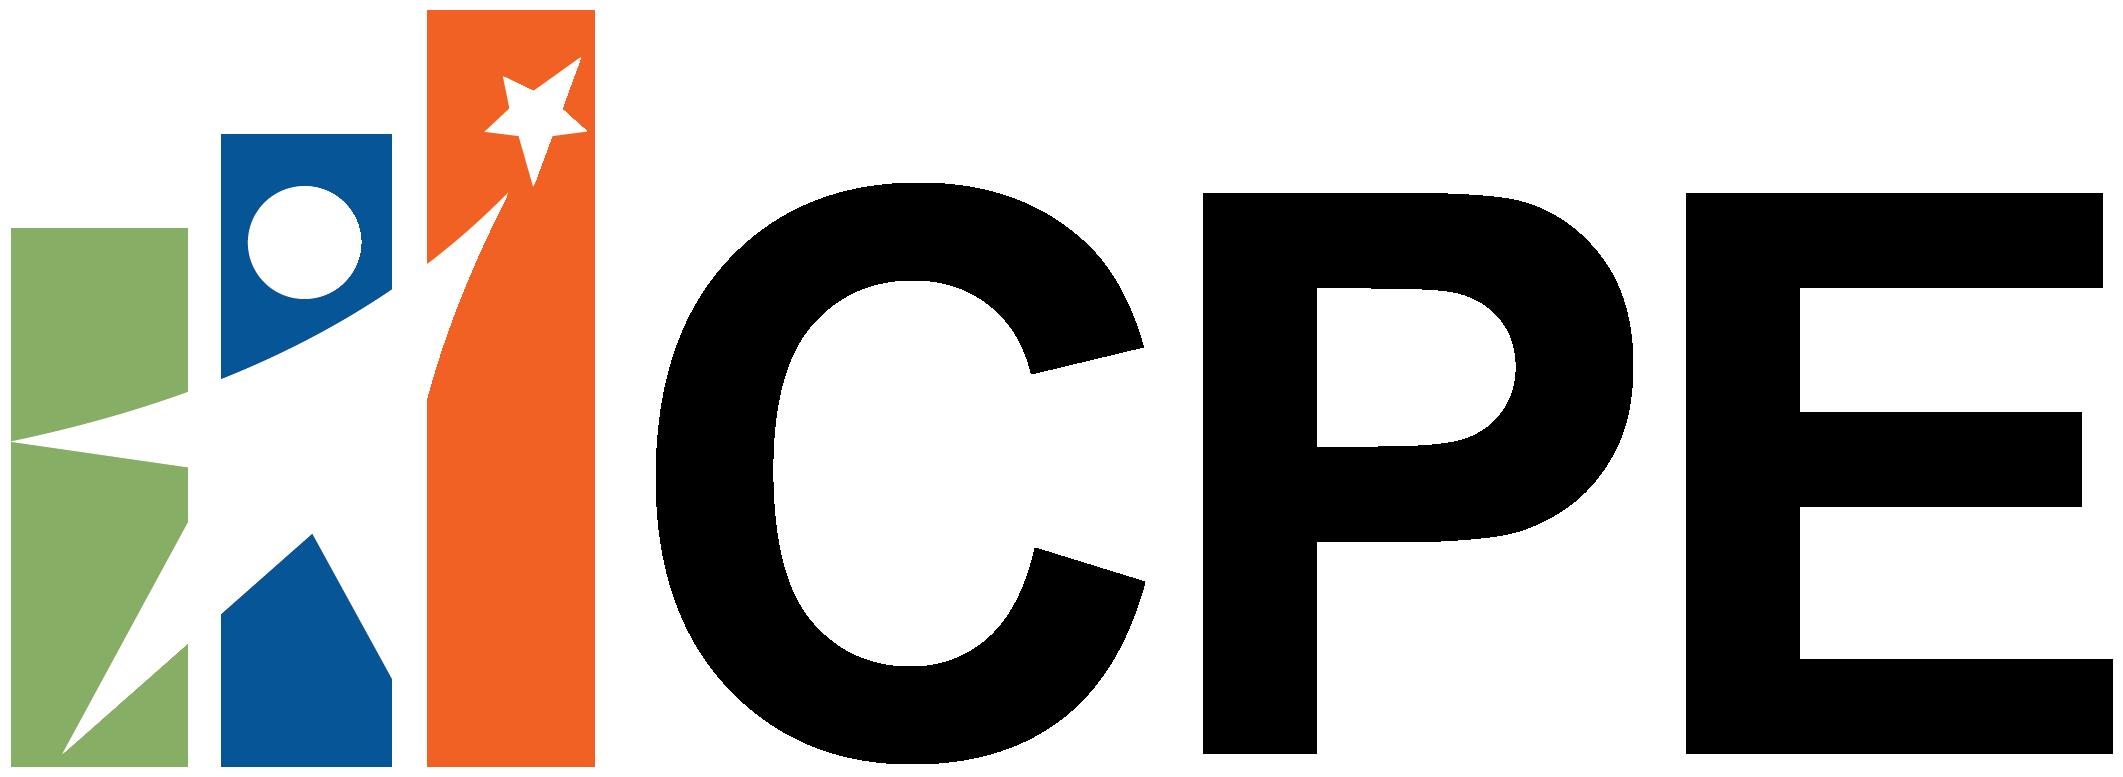 Kentucky Council on Postsecondary Education logo